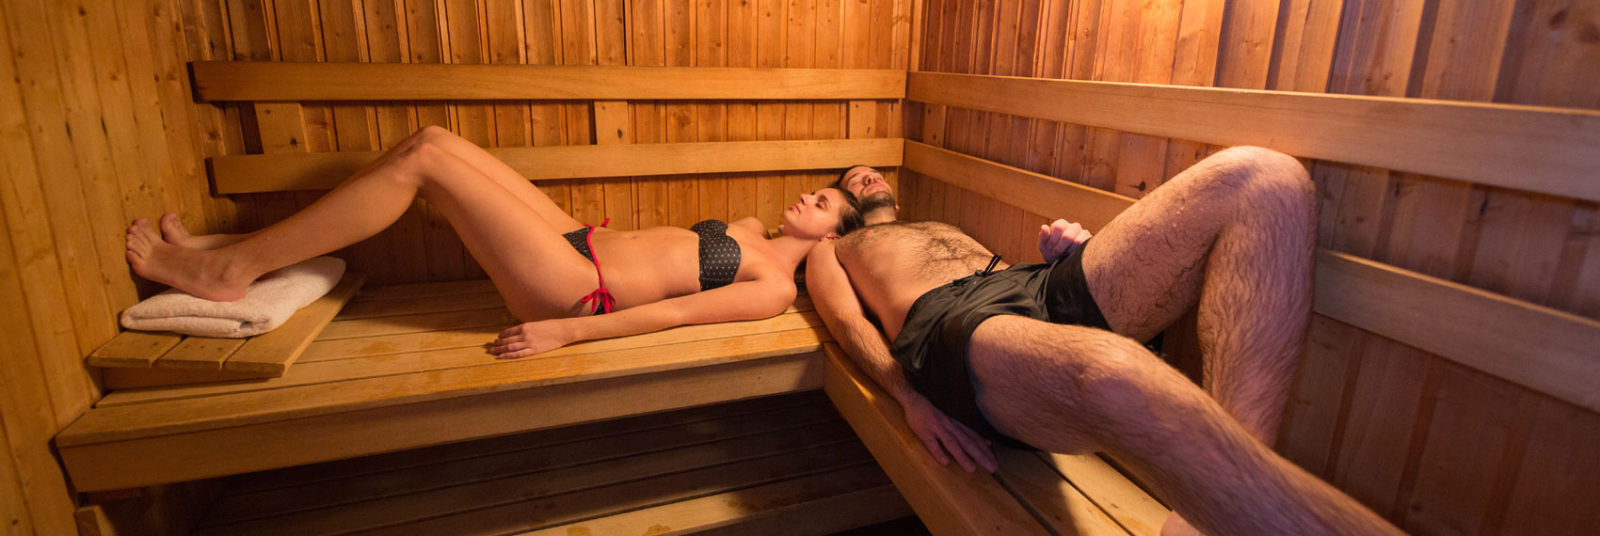 Hotel spa sauna Puy St Vincent